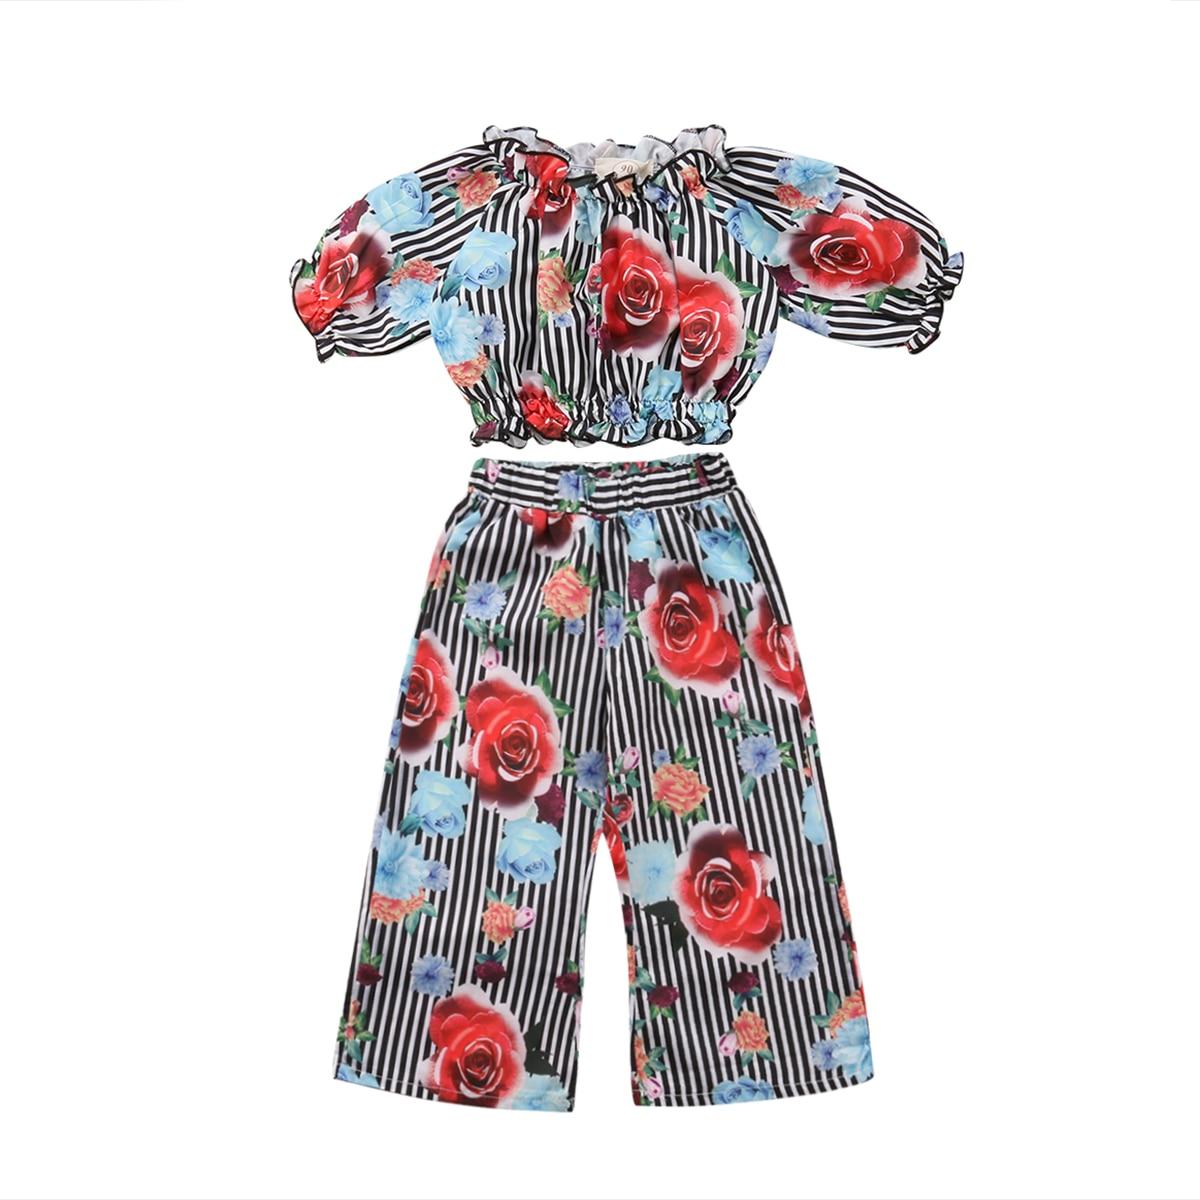 2PCS Set Kids Baby Girls Print T-shirt Tank Tops+Loose Wide Leg Pant Striped Outfits Clothes